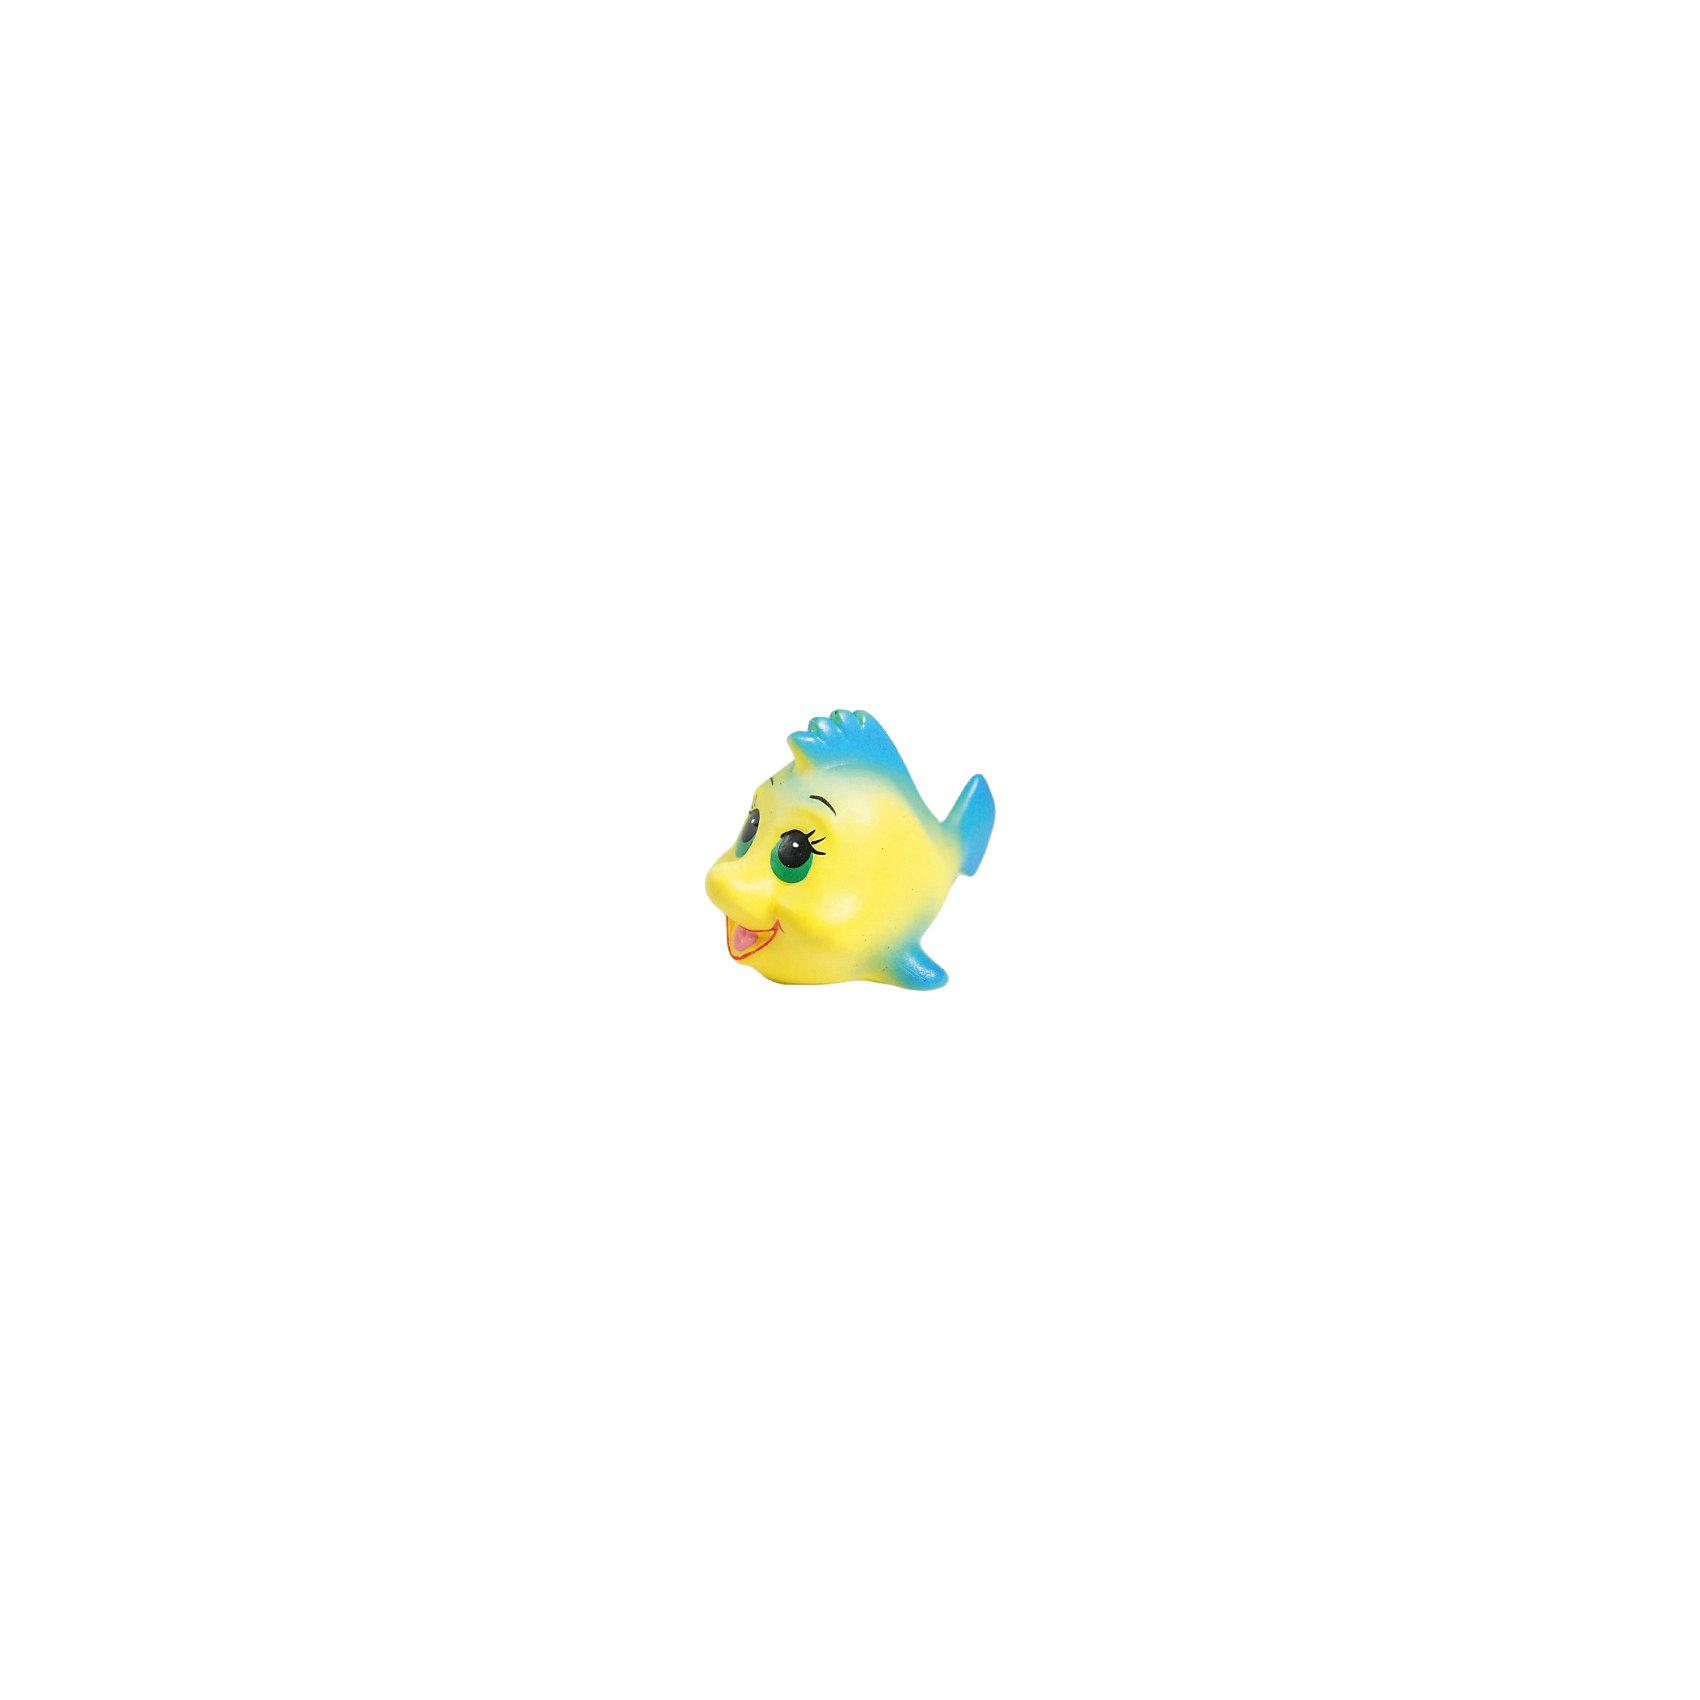 Рыбка морская, Кудесники<br><br>Ширина мм: 80<br>Глубина мм: 60<br>Высота мм: 65<br>Вес г: 50<br>Возраст от месяцев: 12<br>Возраст до месяцев: 36<br>Пол: Унисекс<br>Возраст: Детский<br>SKU: 4896452